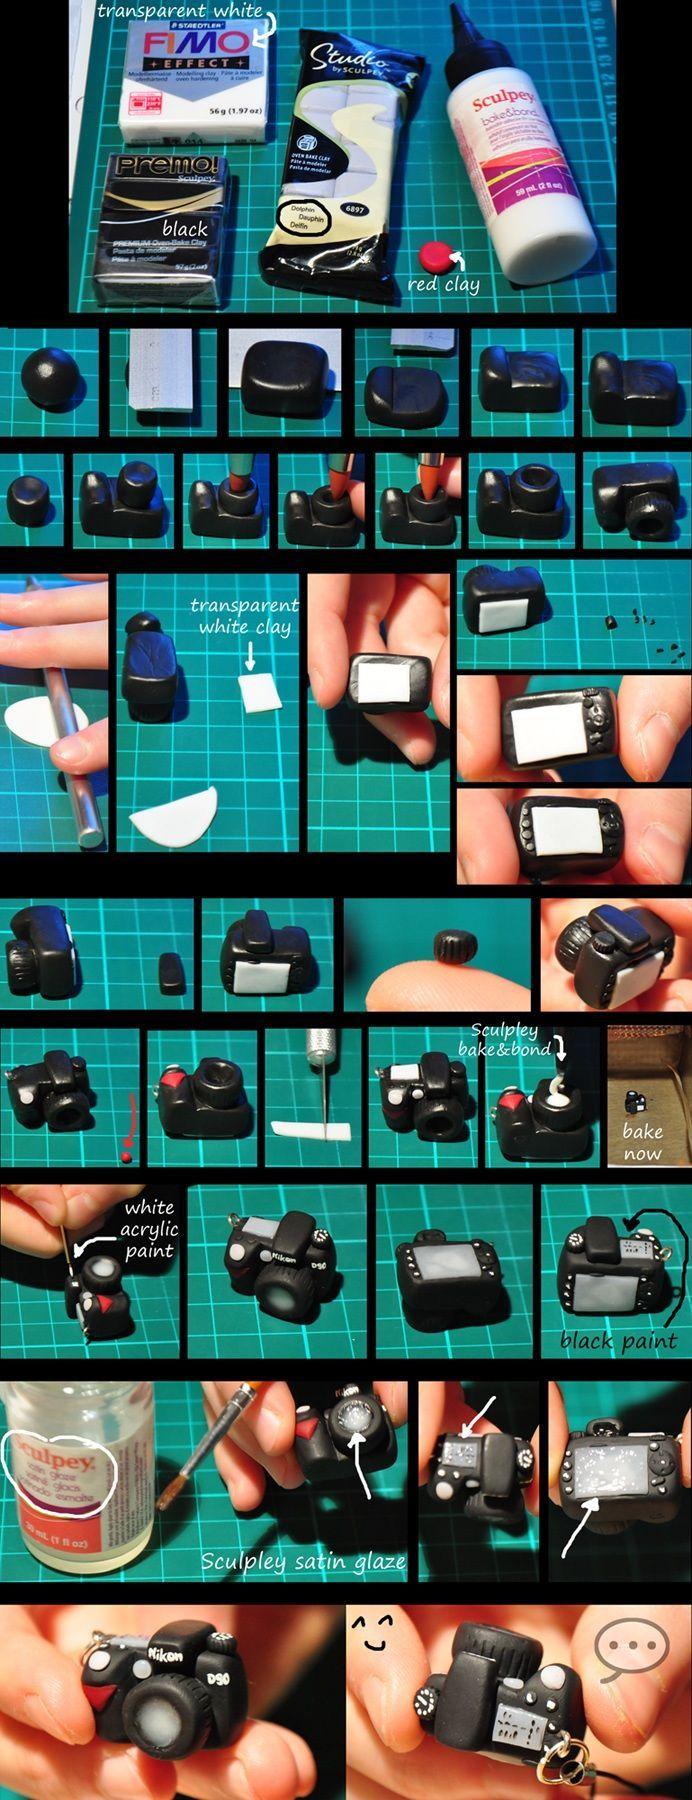 Nikon camera tutorial.